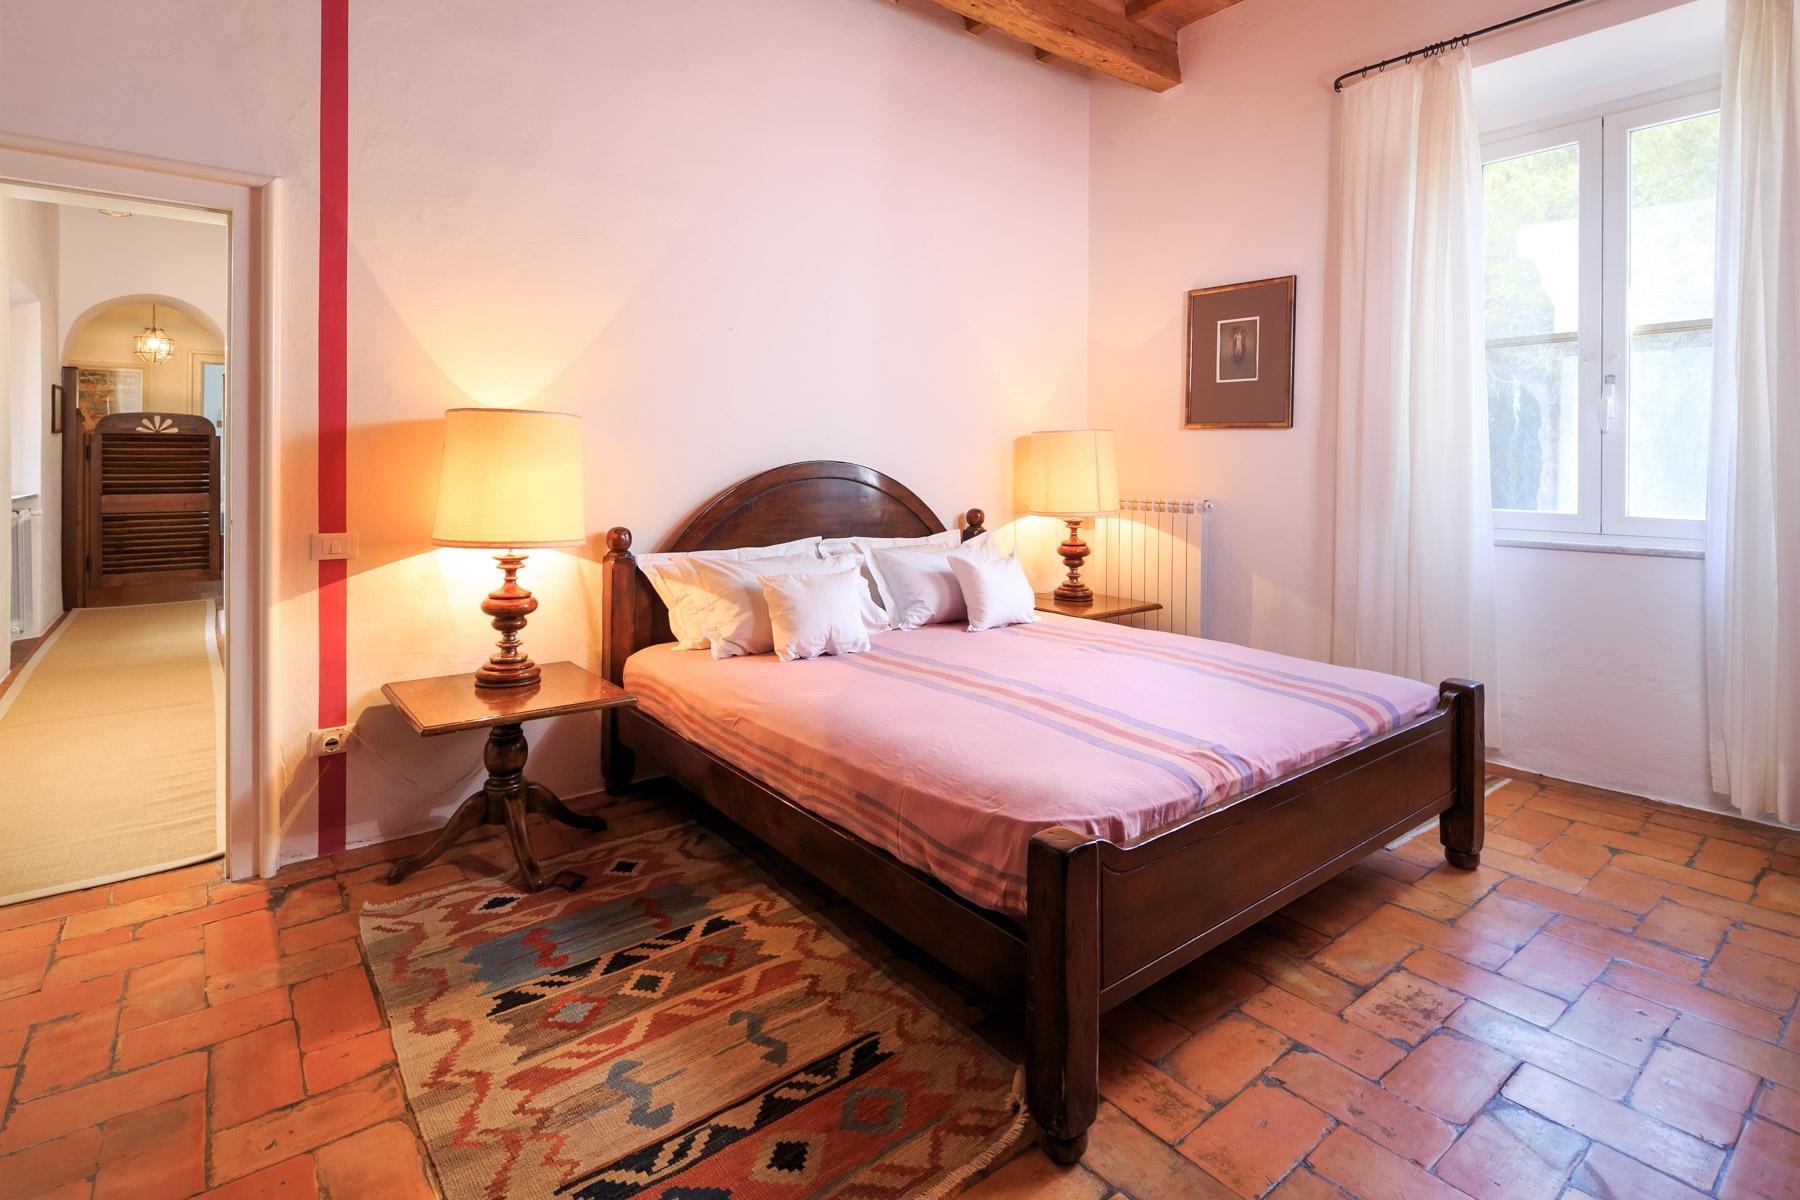 Villa in Vendita a Campiglia Marittima: 5 locali, 1100 mq - Foto 19